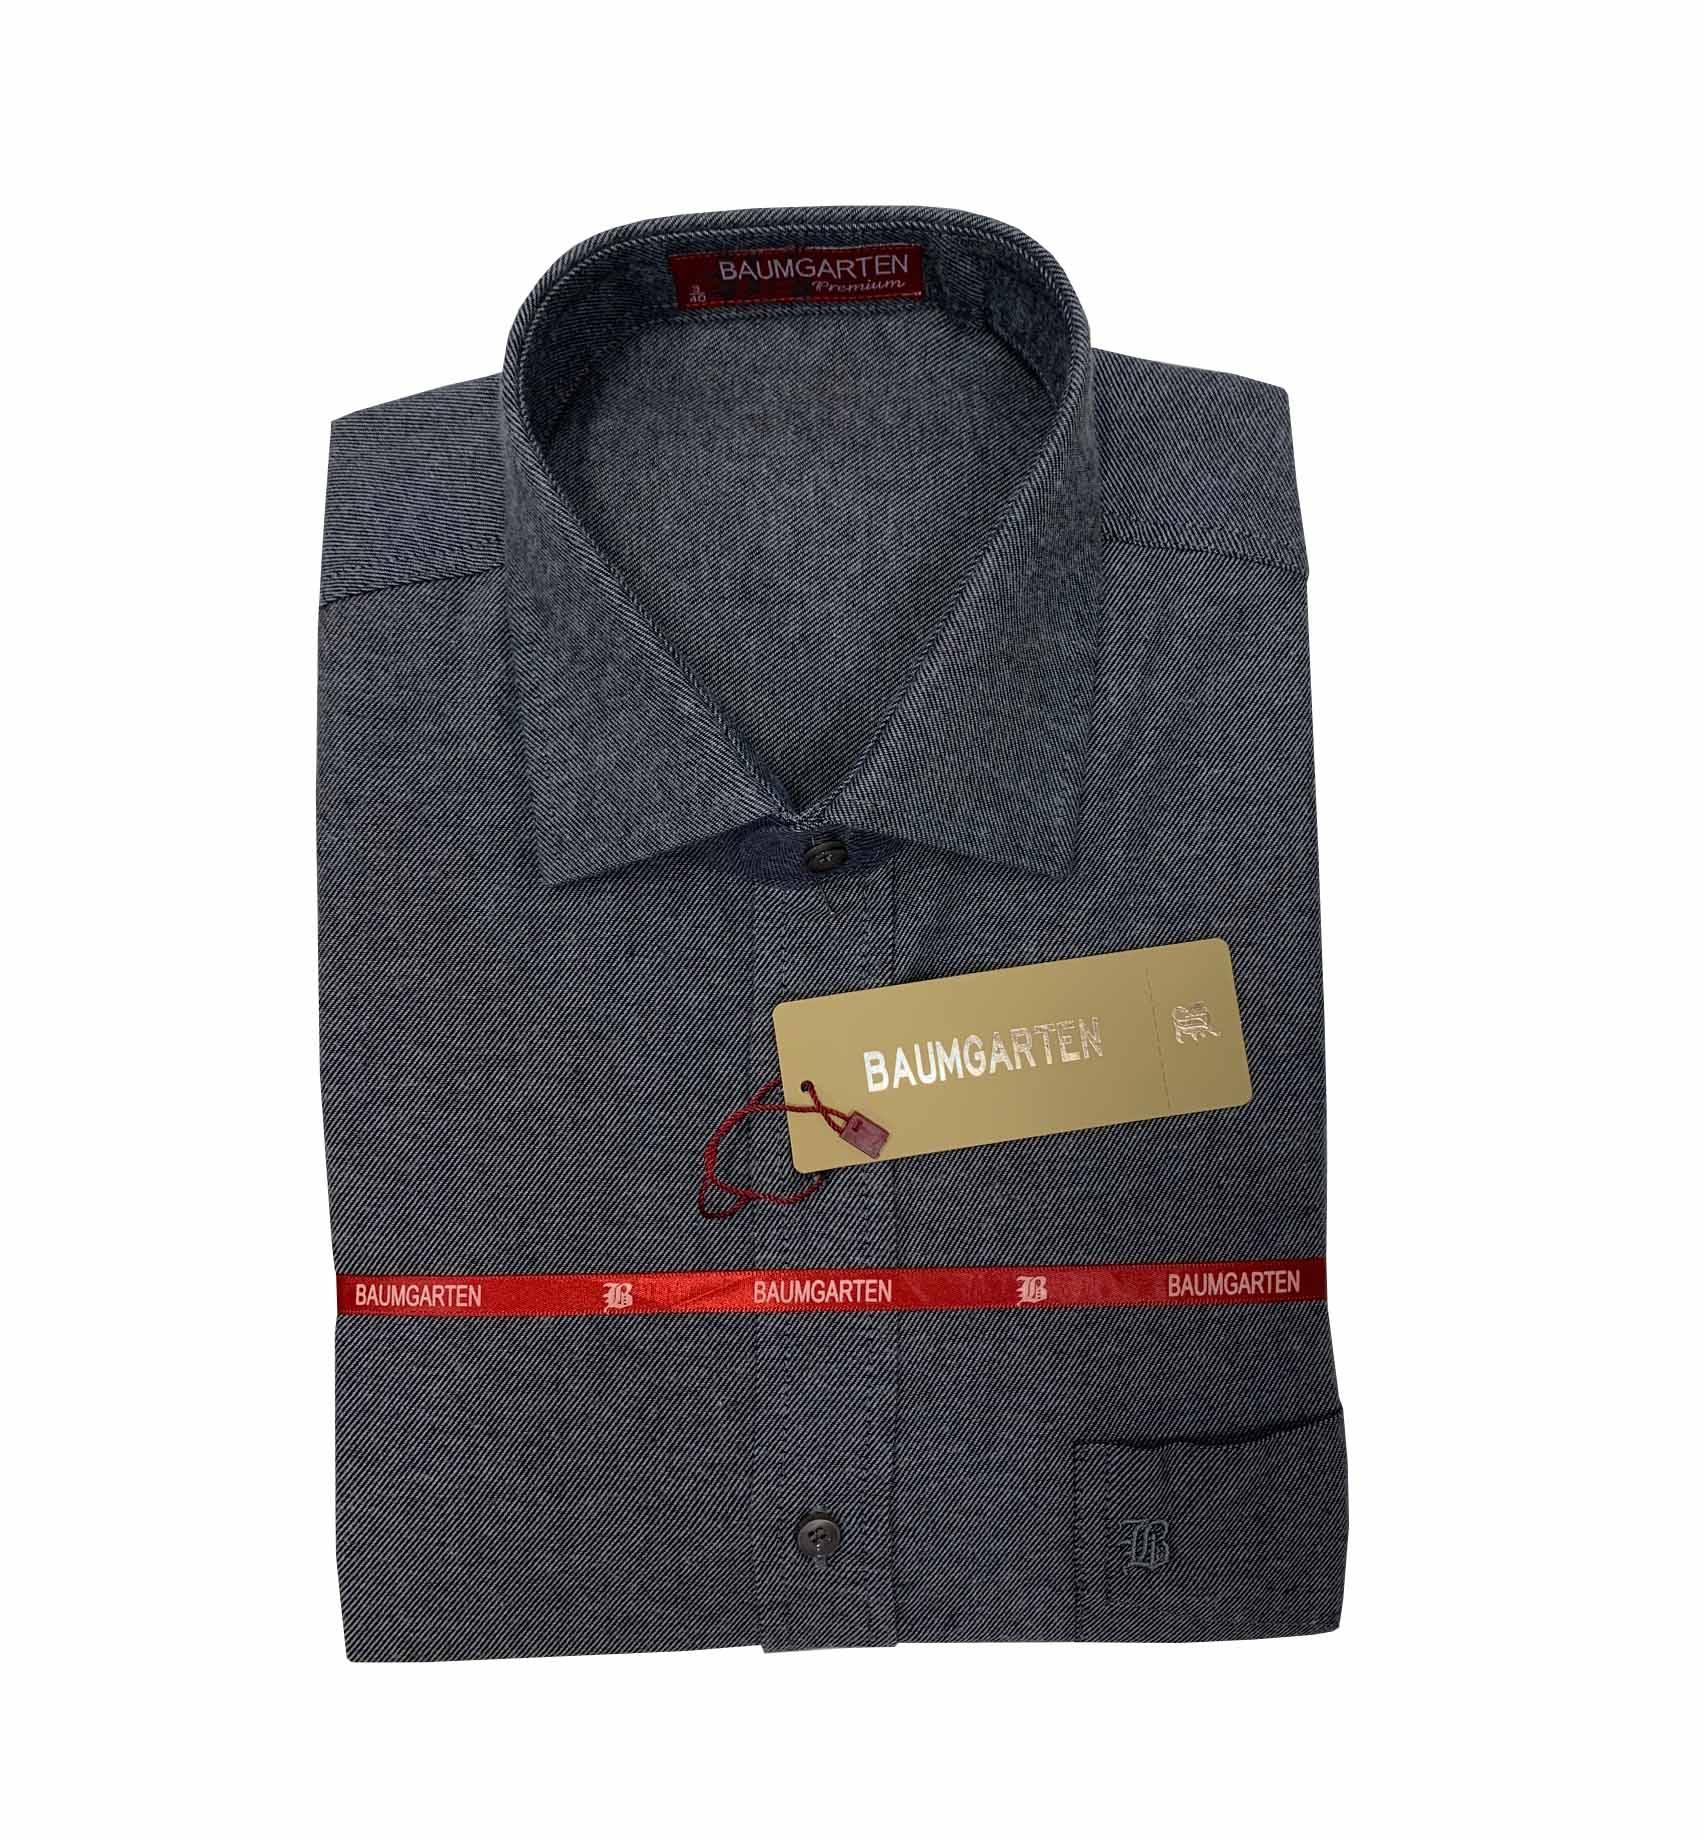 Camisa Baumgarten FLANELA Manga Longa Premium 3809 Masculina